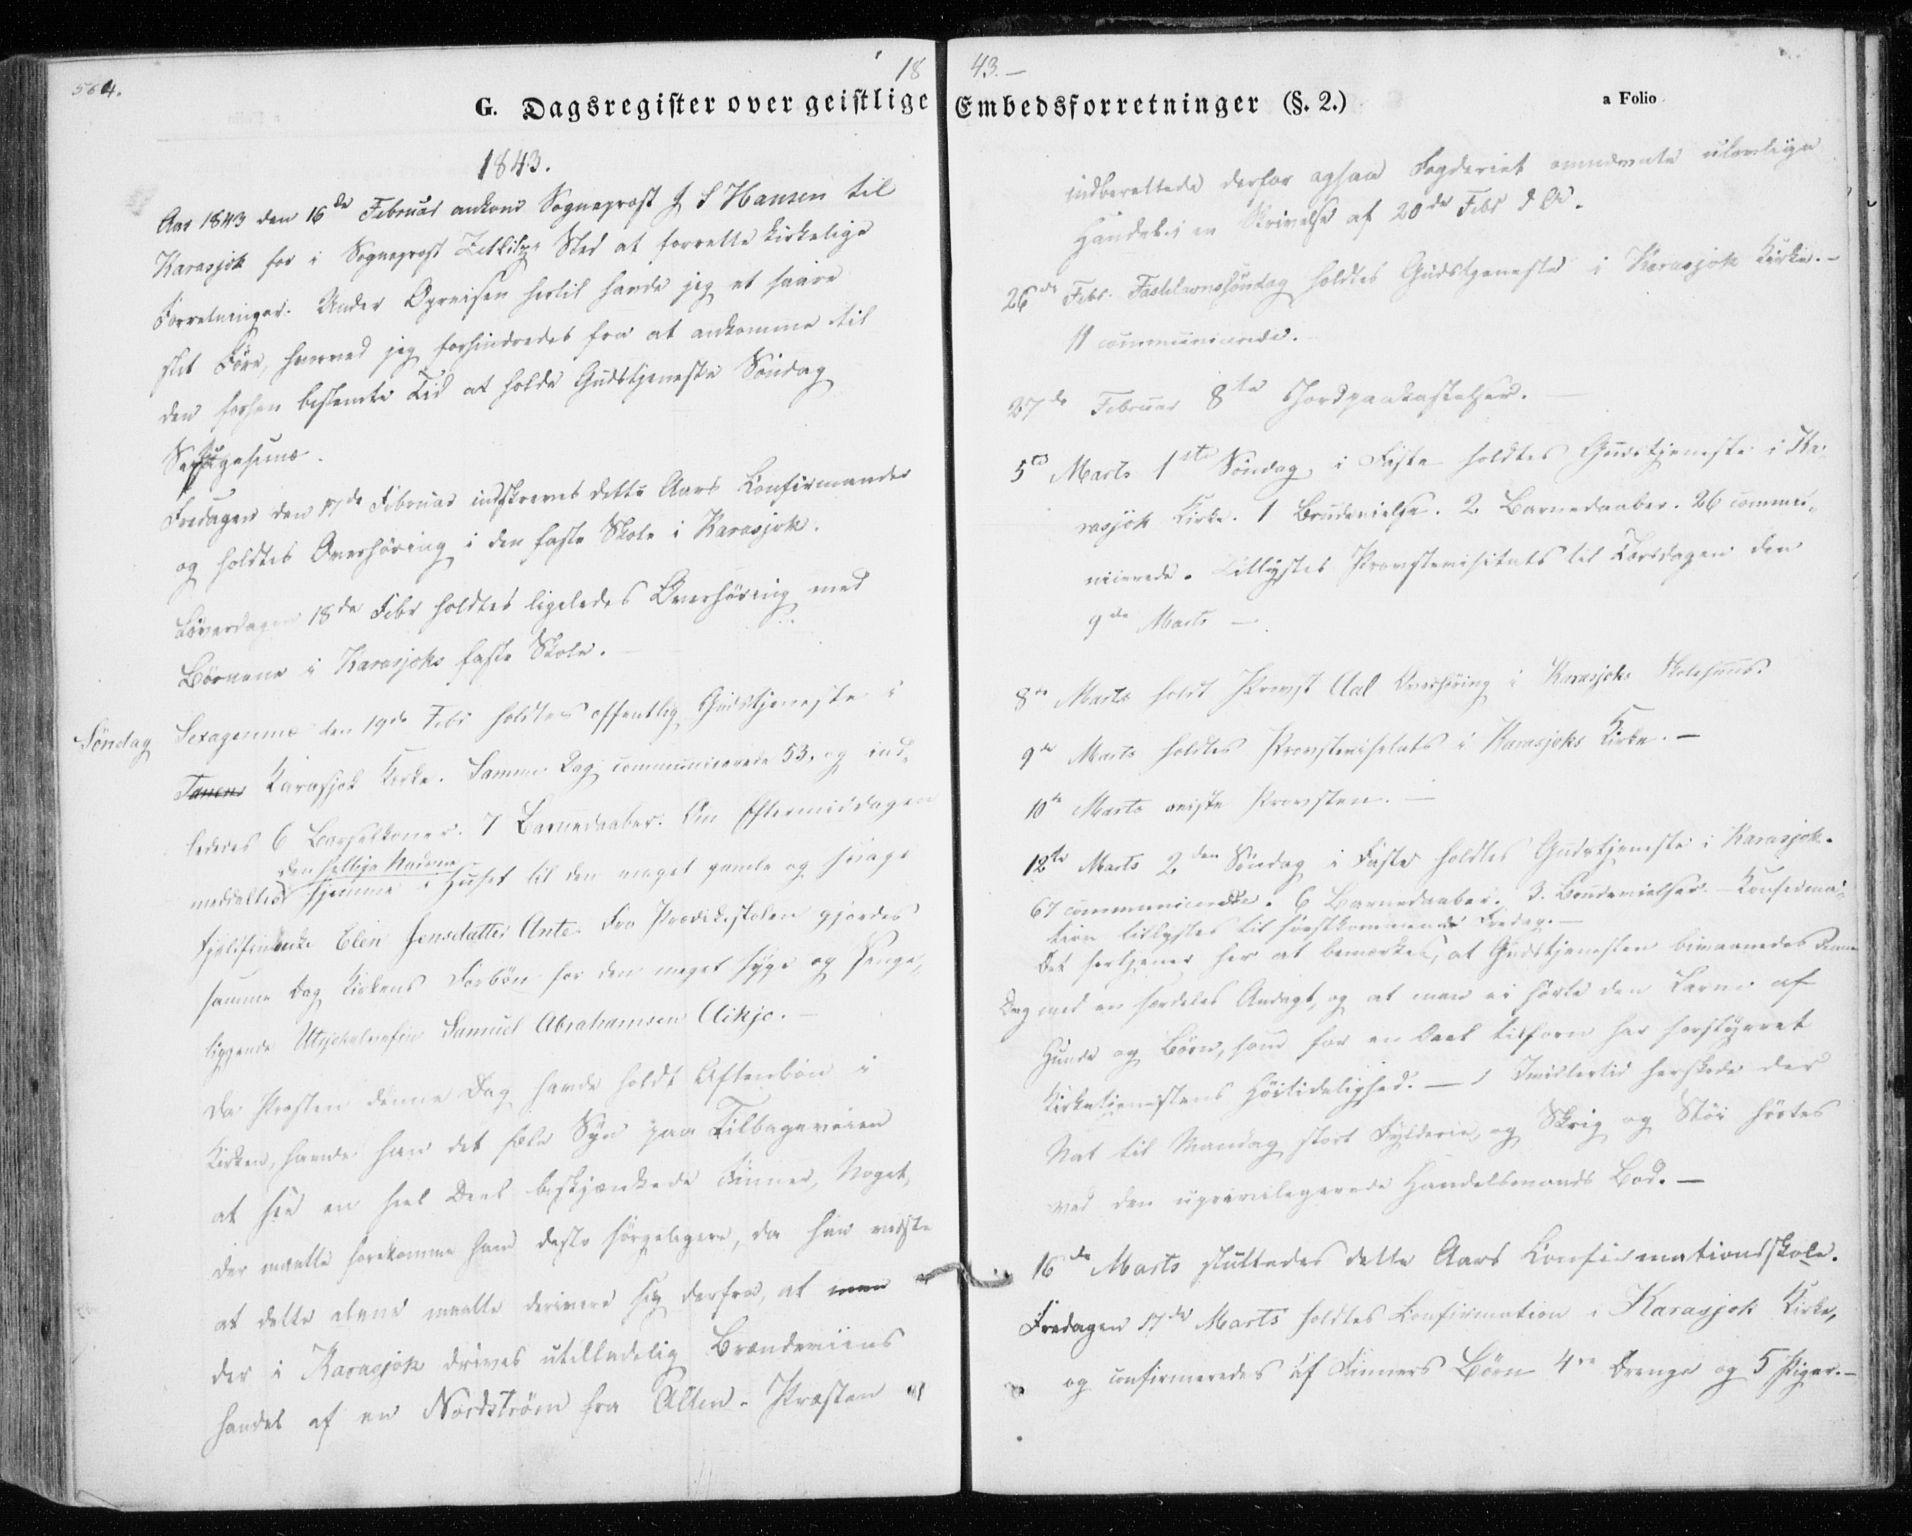 SATØ, Kistrand/Porsanger sokneprestembete, H/Ha/L0012.kirke: Ministerialbok nr. 12, 1843-1871, s. 564-565